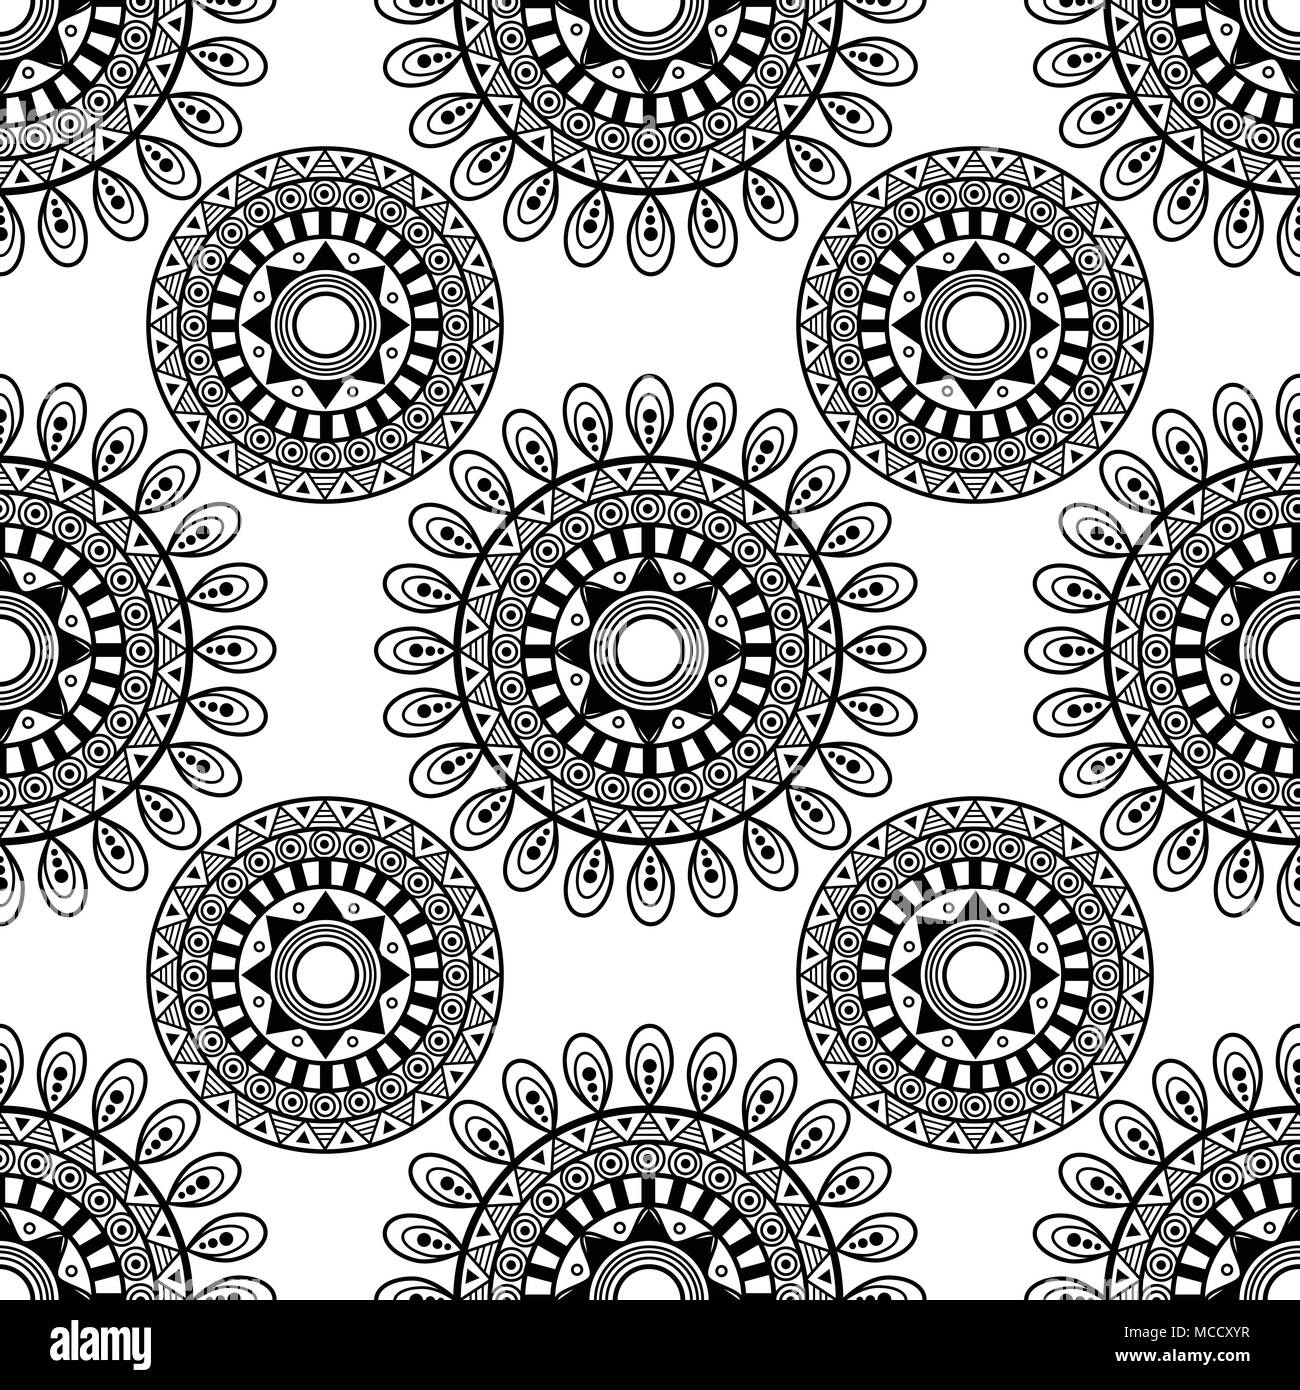 siamless pattern. sentagle. isolate. vector. - Stock Image